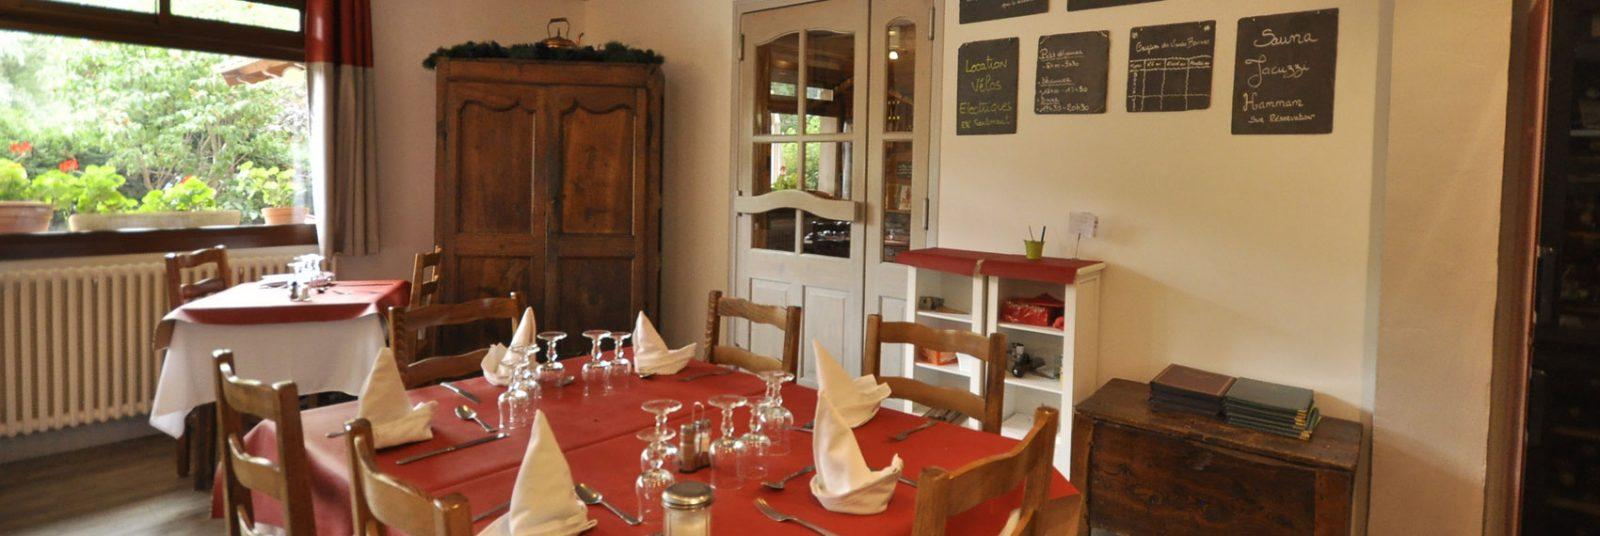 Hotel l'Aiglière, restaurant